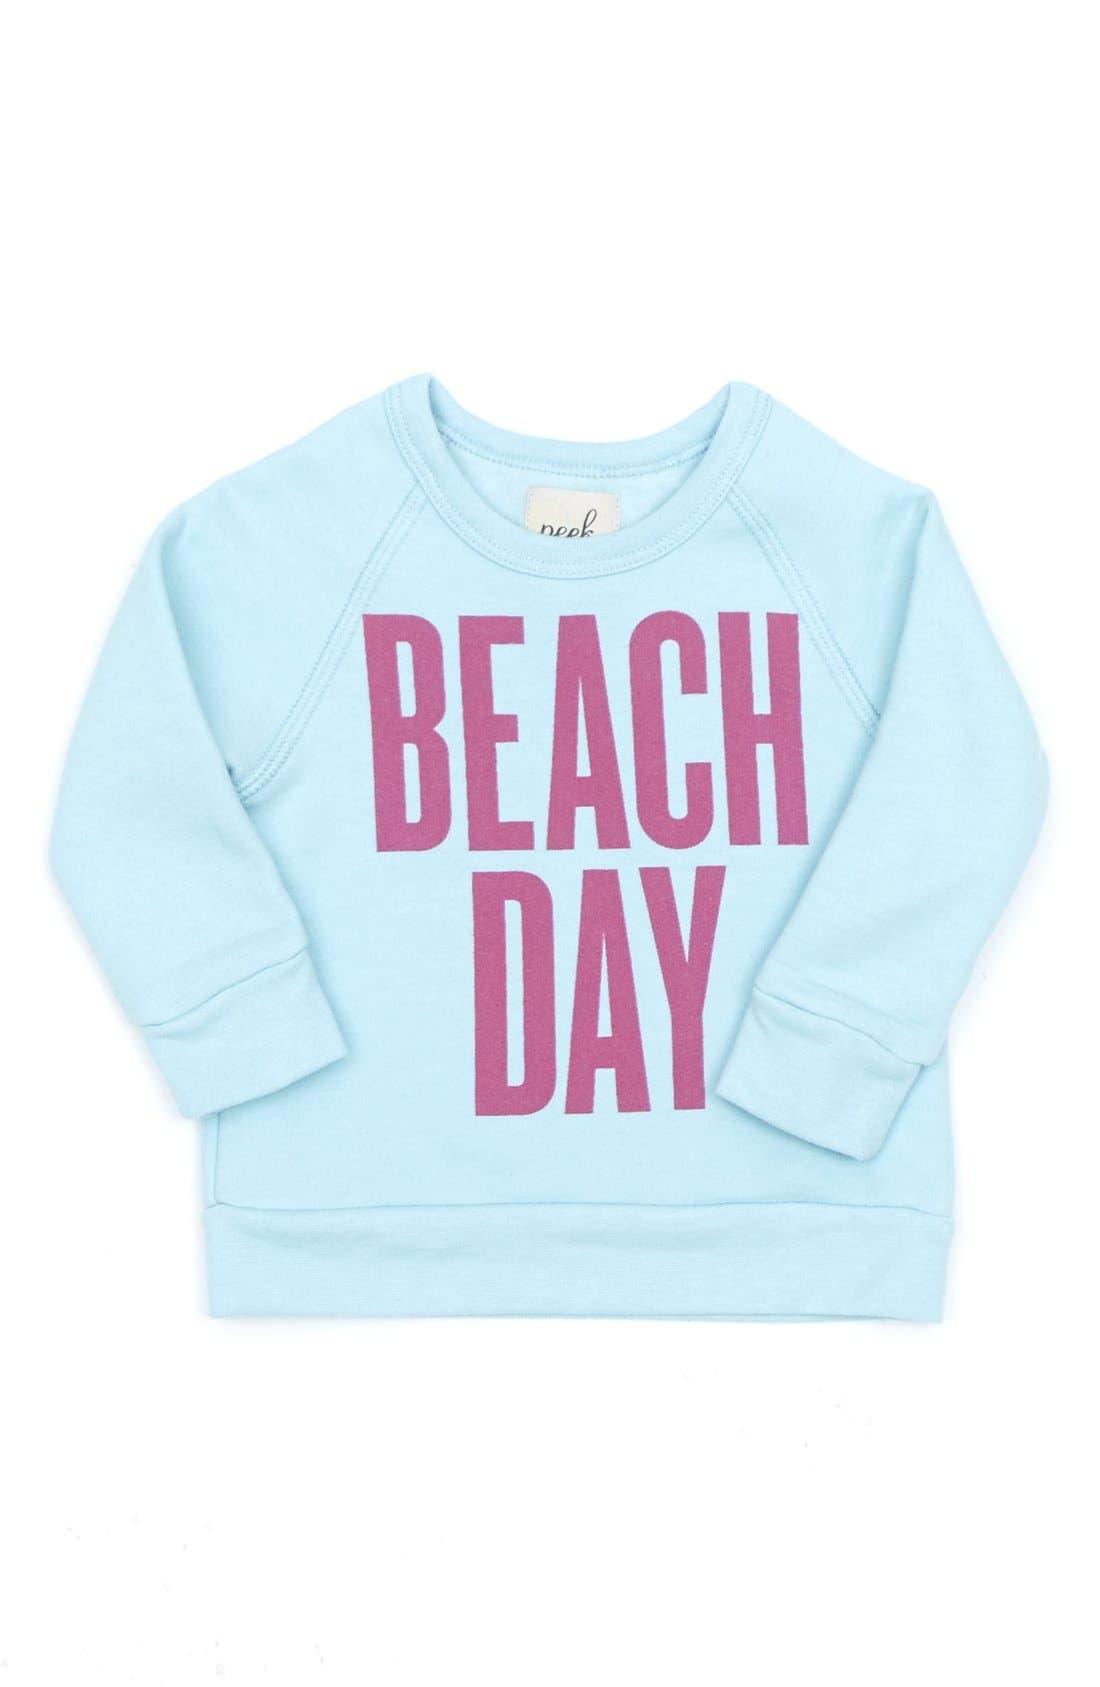 Alternate Image 1 Selected - Peek 'Beach Day' Crewneck Sweatshirt (Toddler Girls, Little Girls & Big Girls)